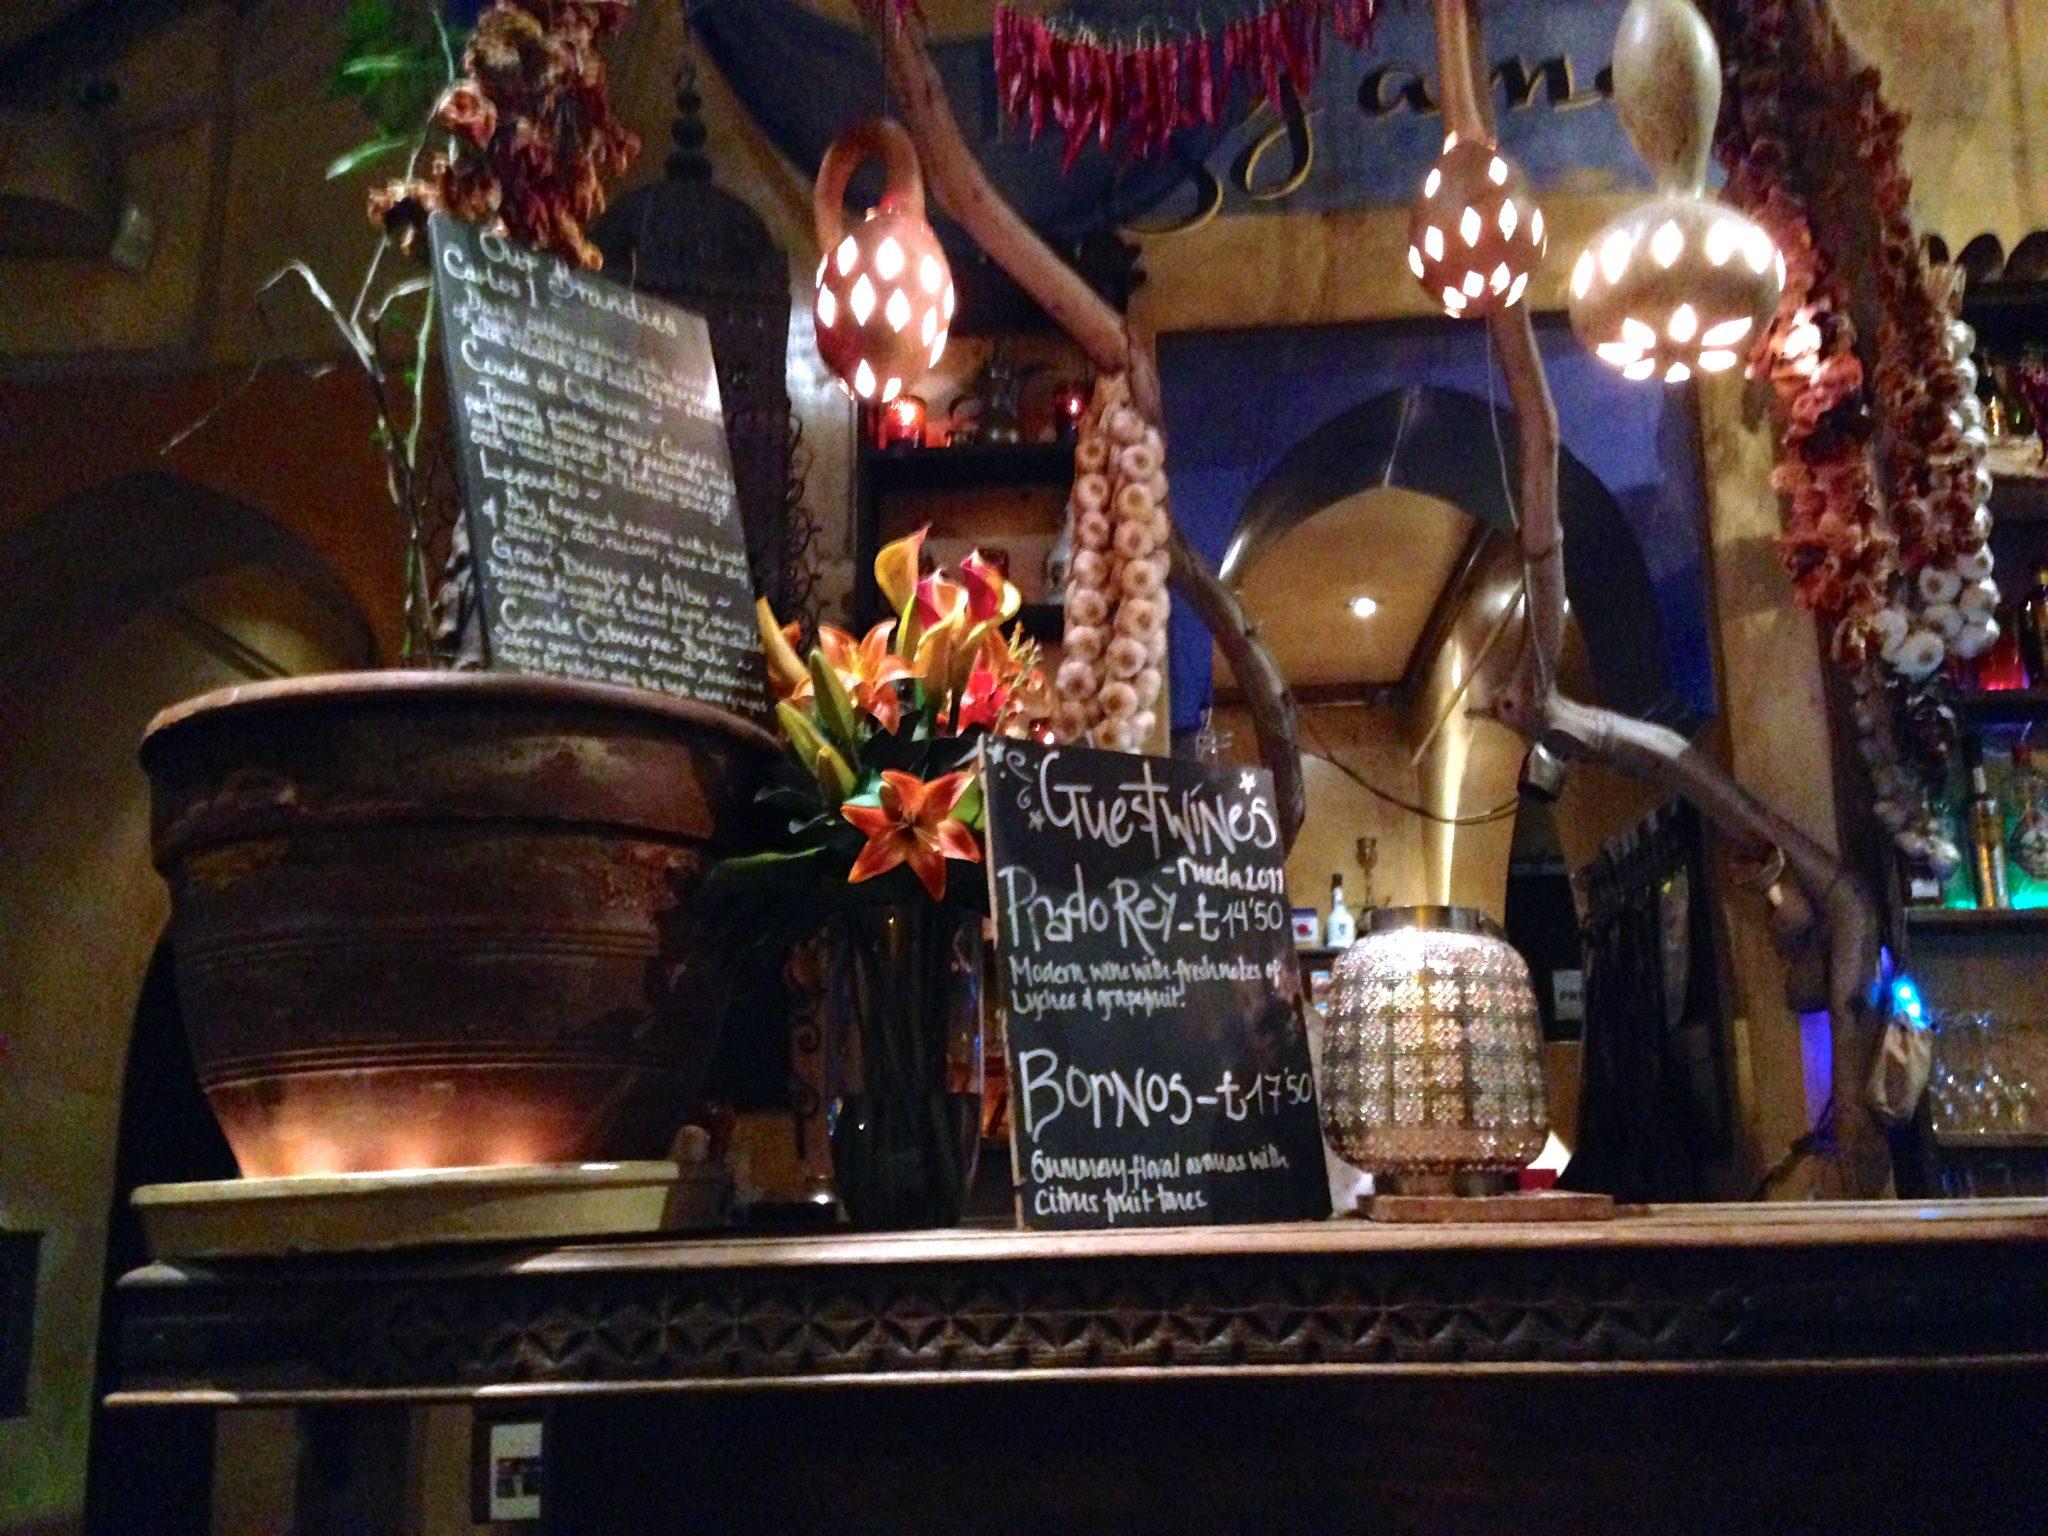 Kazbar Tapas Bar and Restaurant in Cowley Road, Oxford